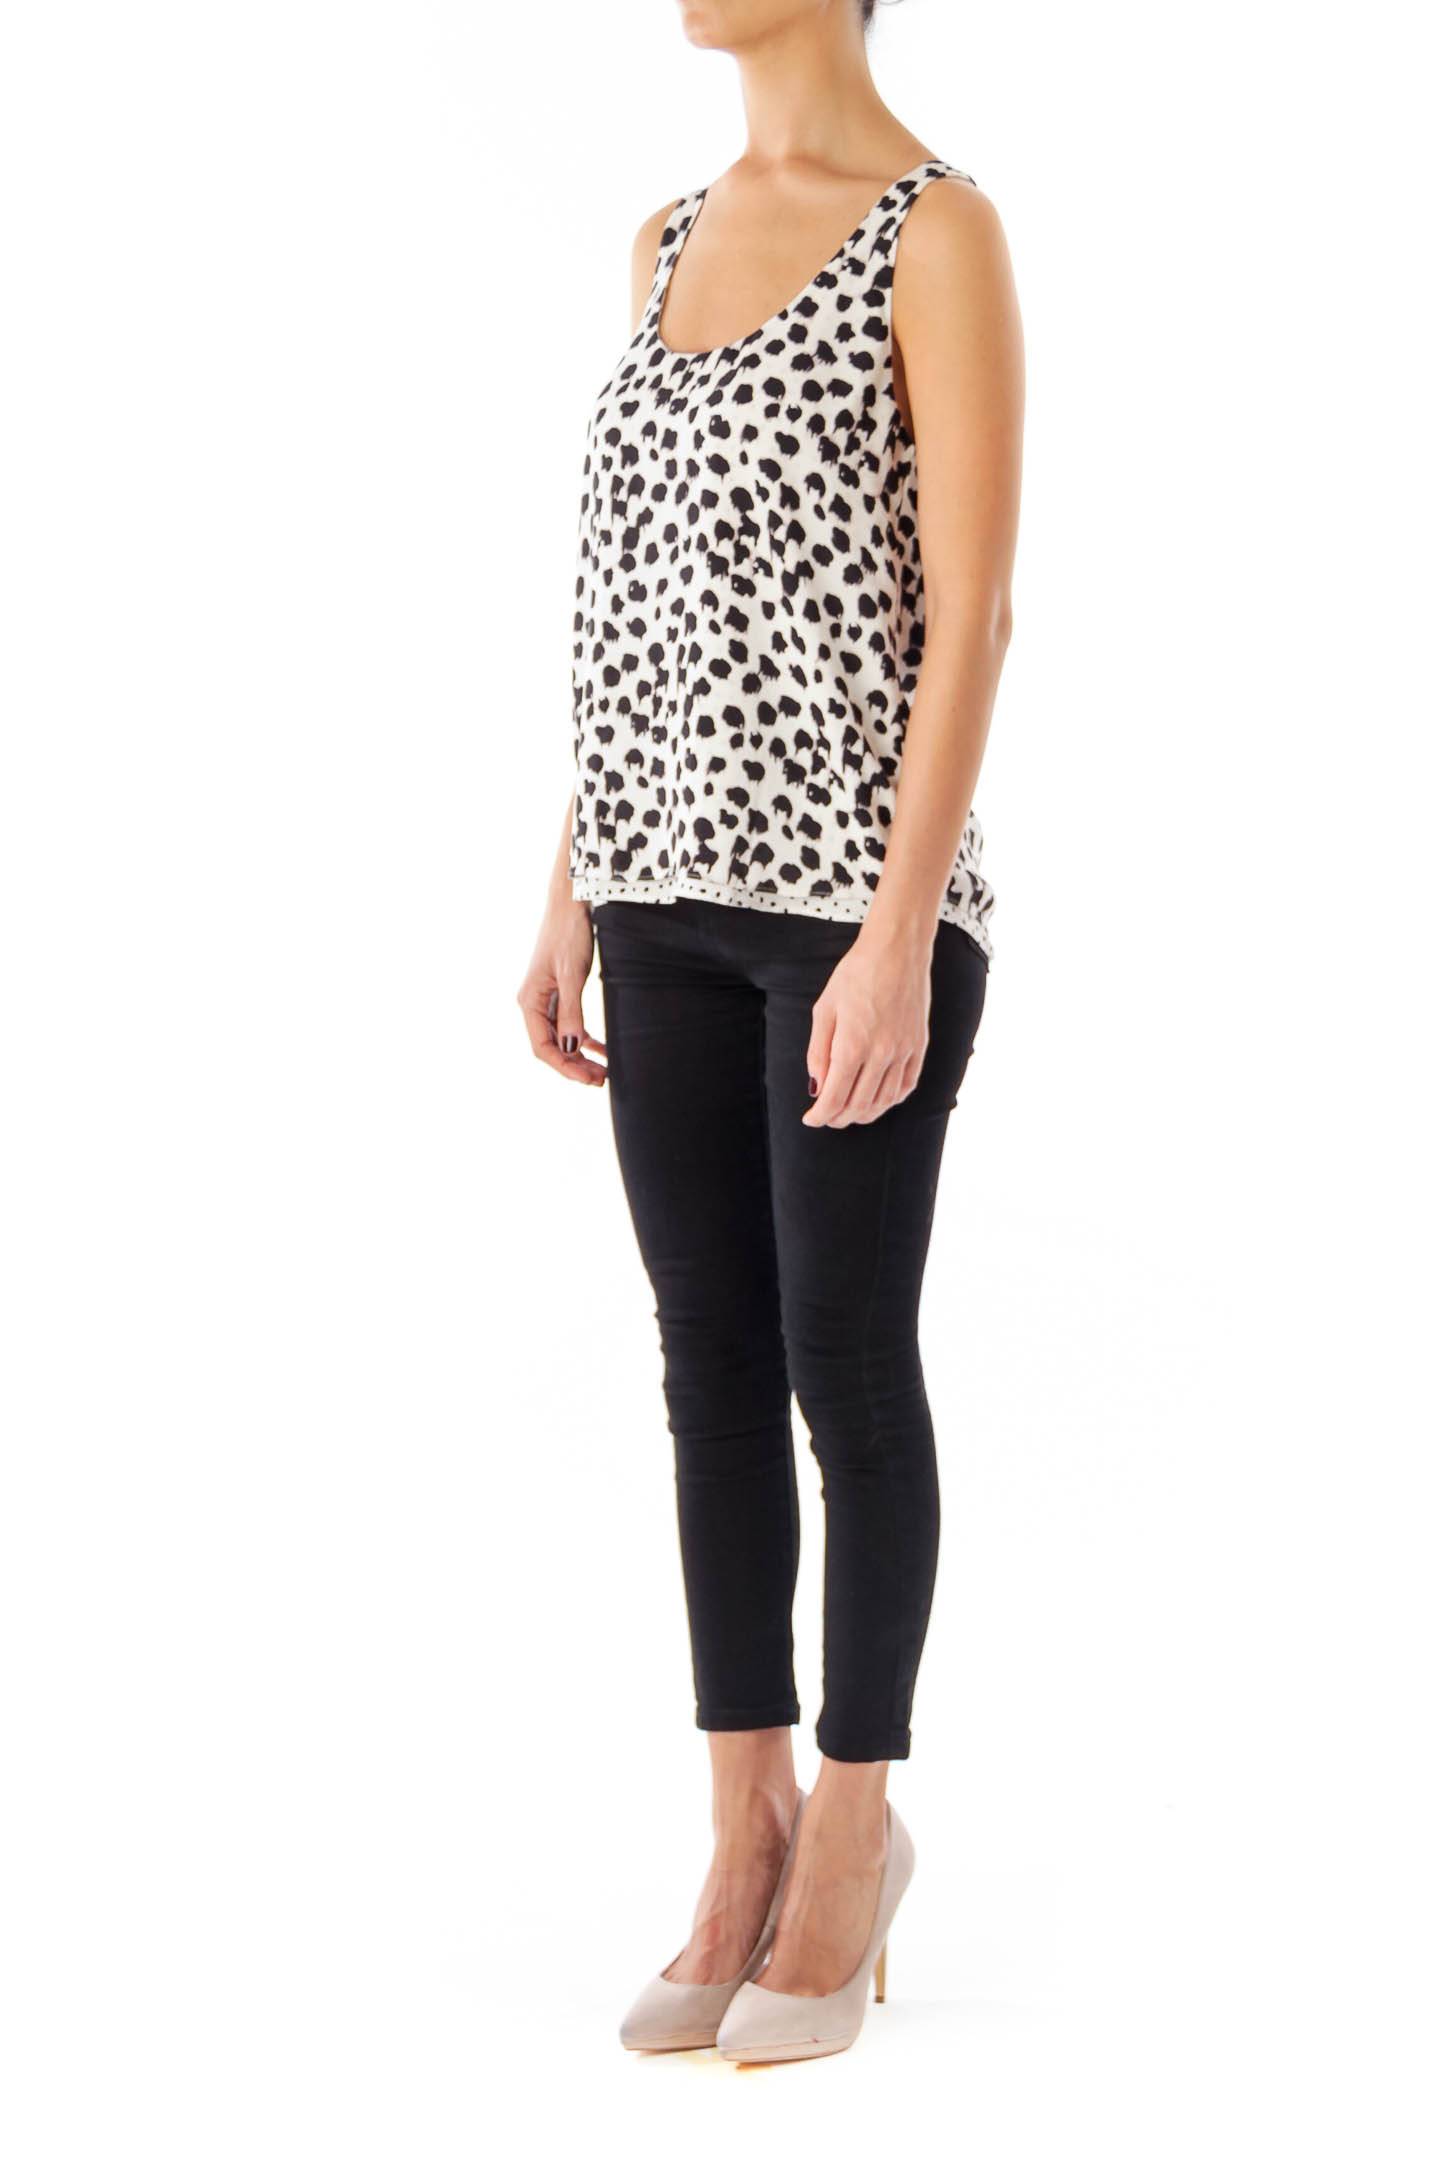 White & Black animal Print Sleeveless top